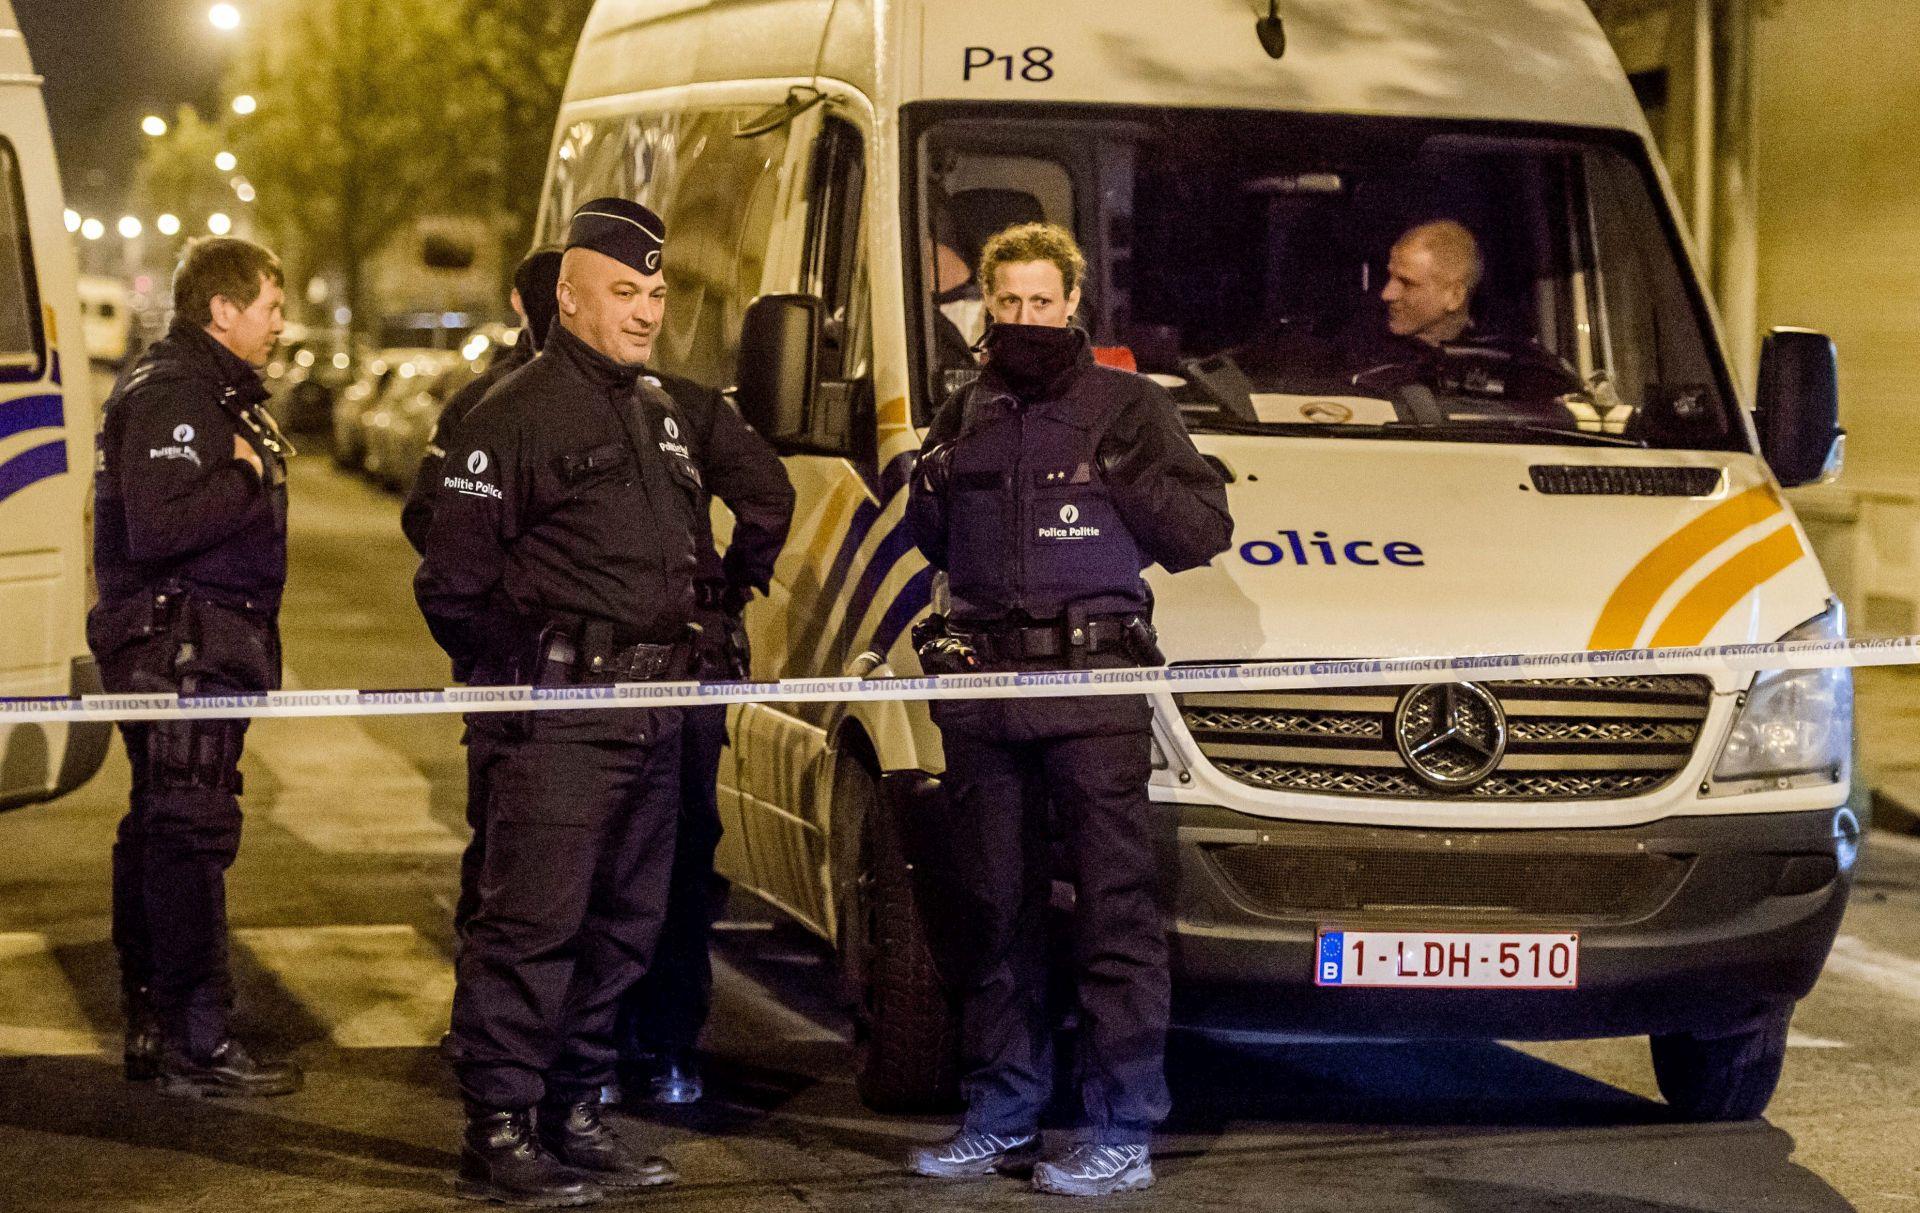 ISLAMSKA DRŽAVA: Braća El Bakraoui su organizatori napada u Parizu i Bruxellesu